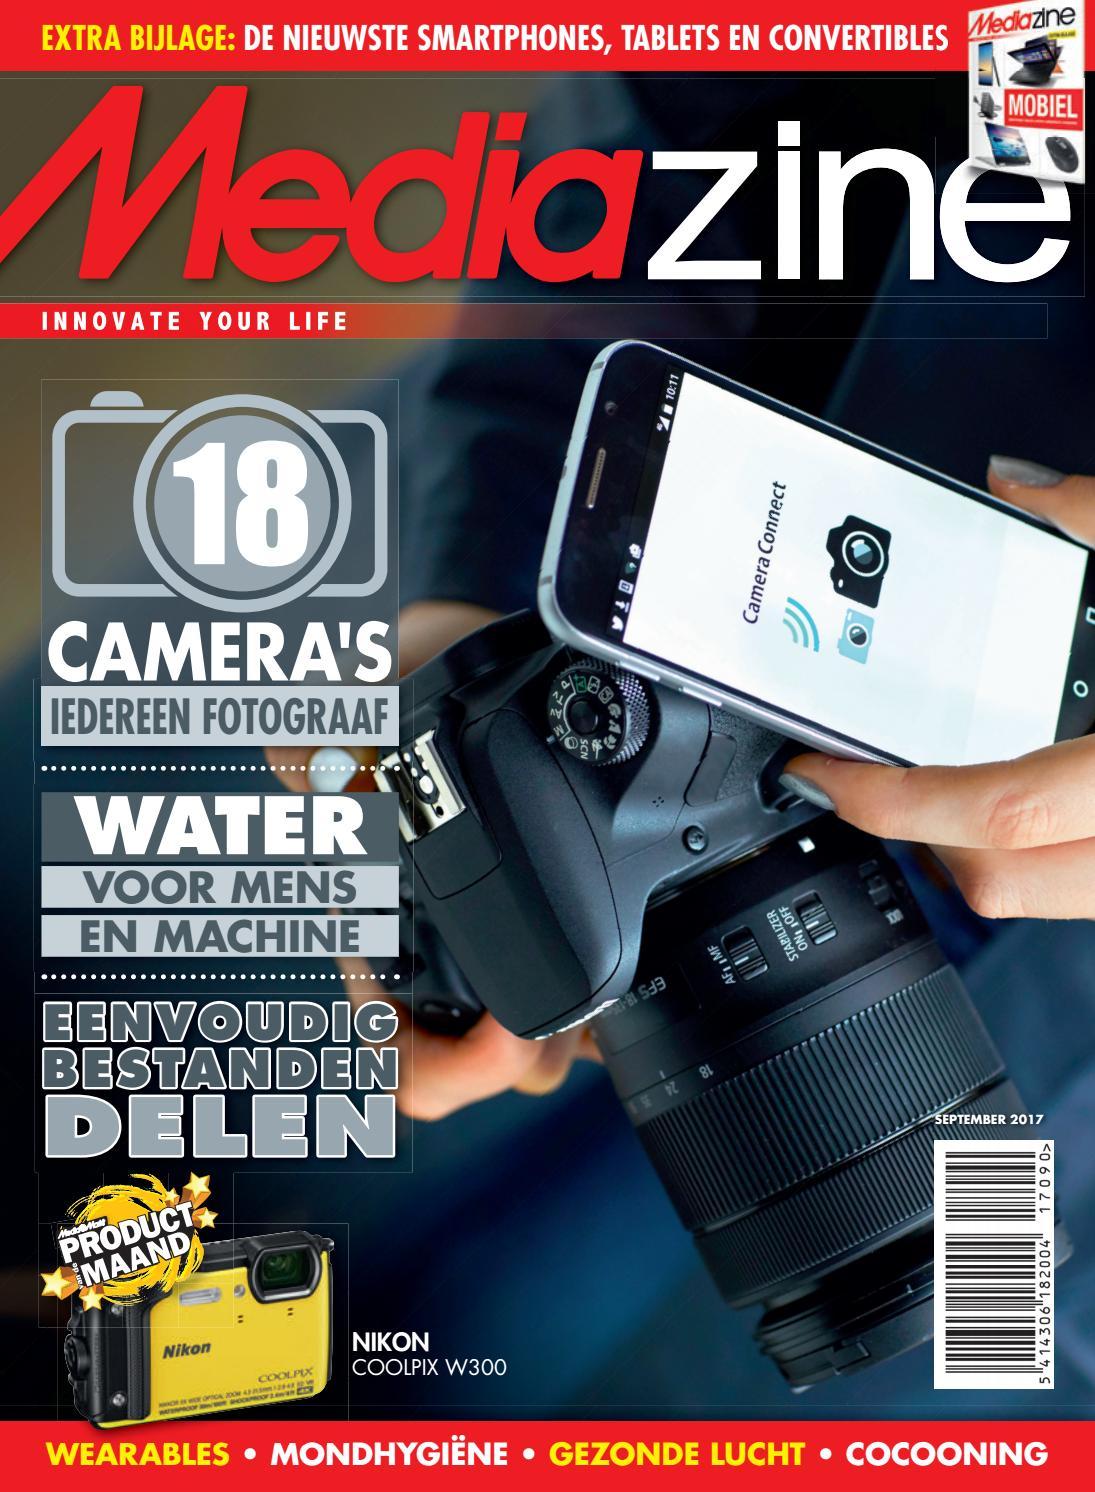 e4da228e16b5fa Mediazine Belgie September 2017 by Mediazine België Belgique - issuu